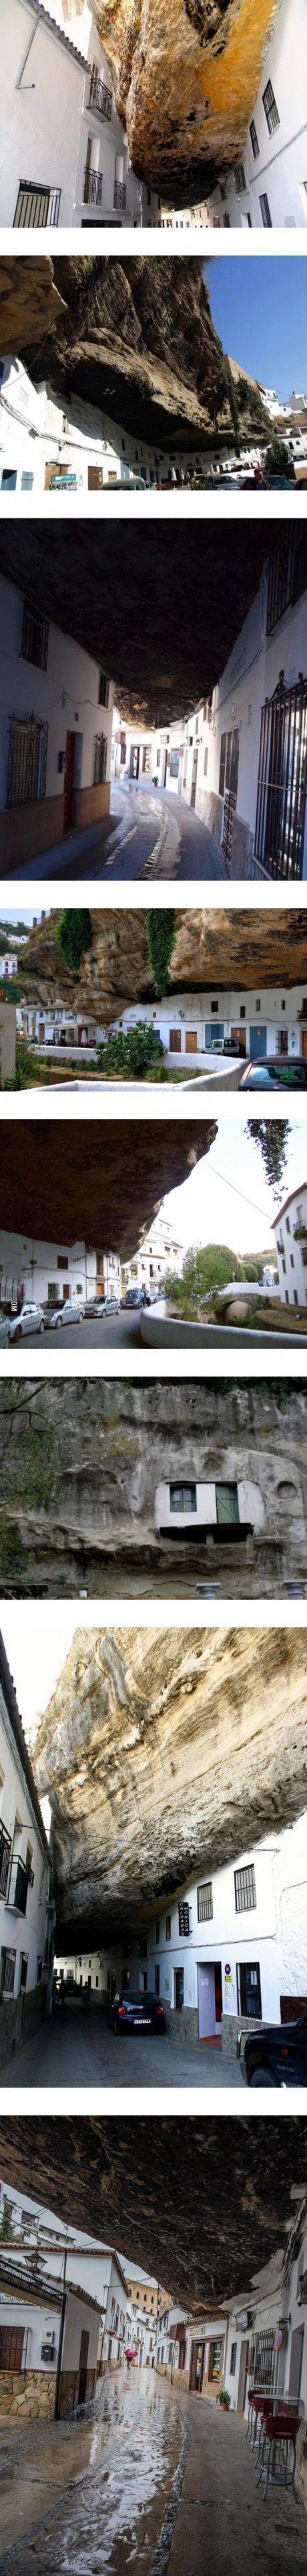 living under a rock... - (town)(spain) - #under #rock #town #spain